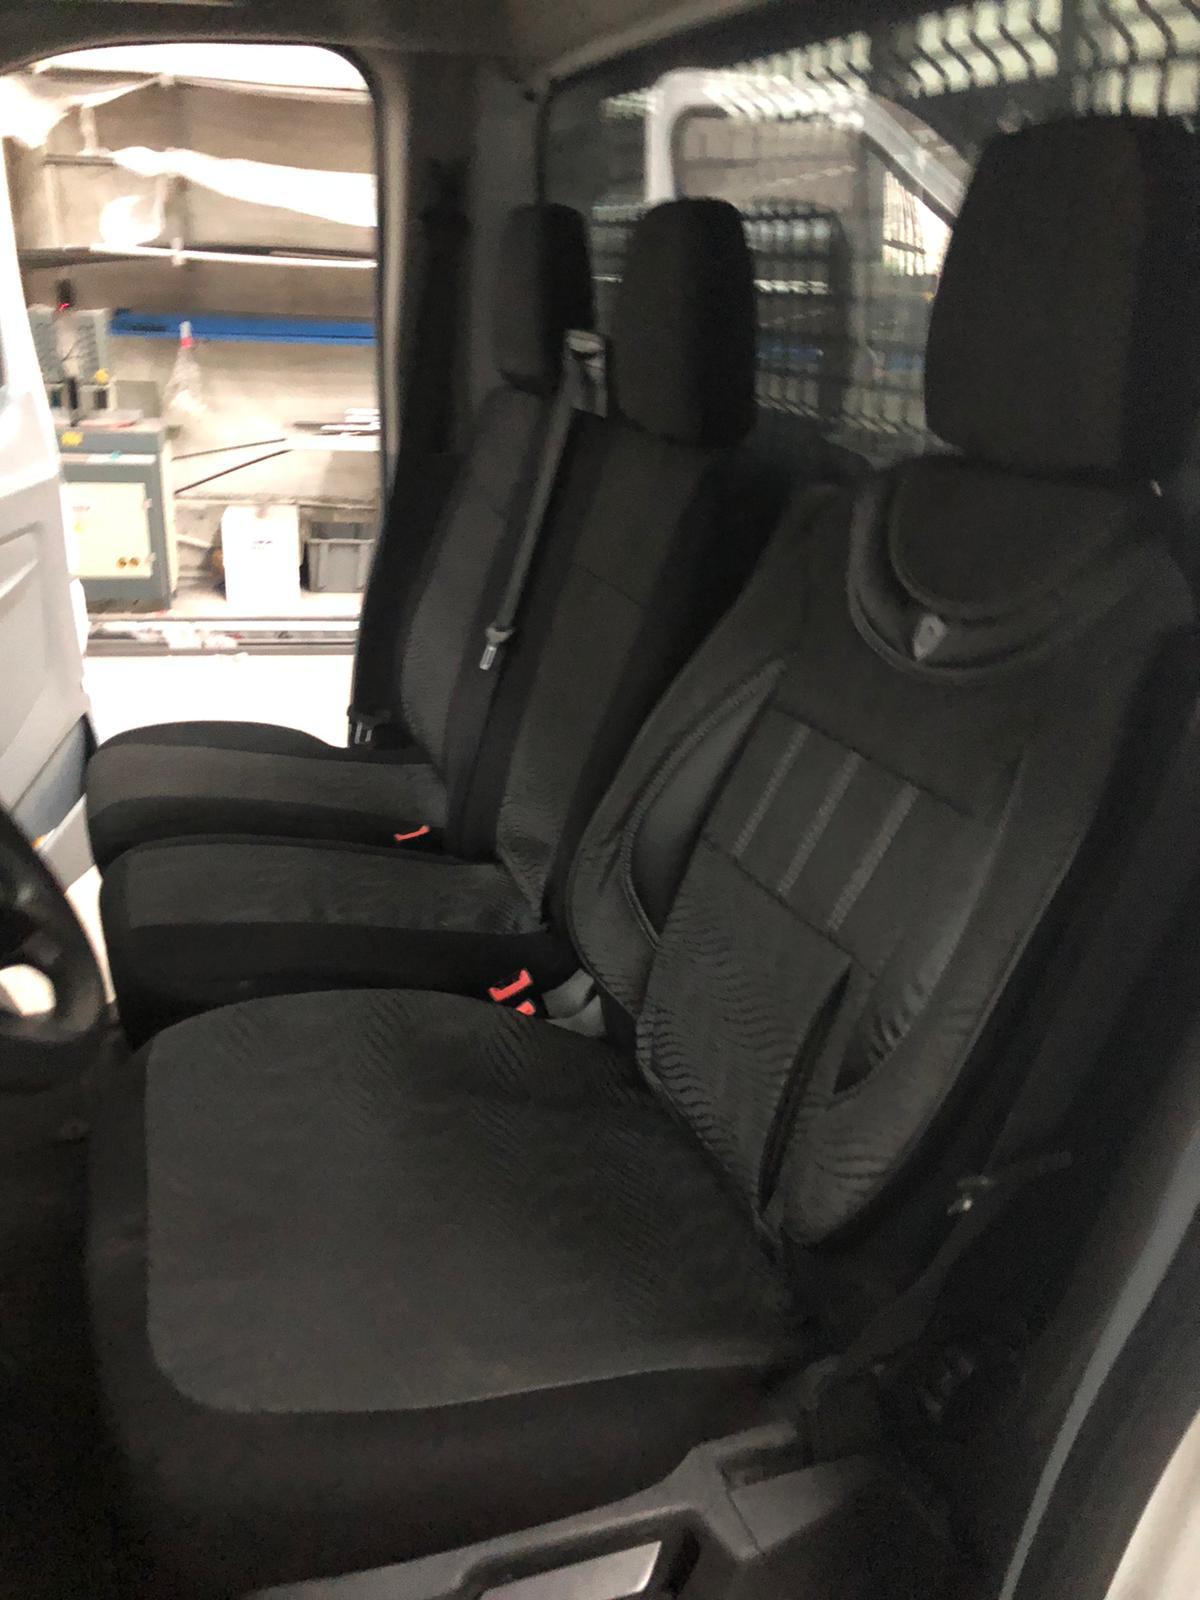 Yeni Ford Transit Panelvan 2 1 Koltuk Kilifi Ortopedik Fiyatlari Ve Ozellikleri